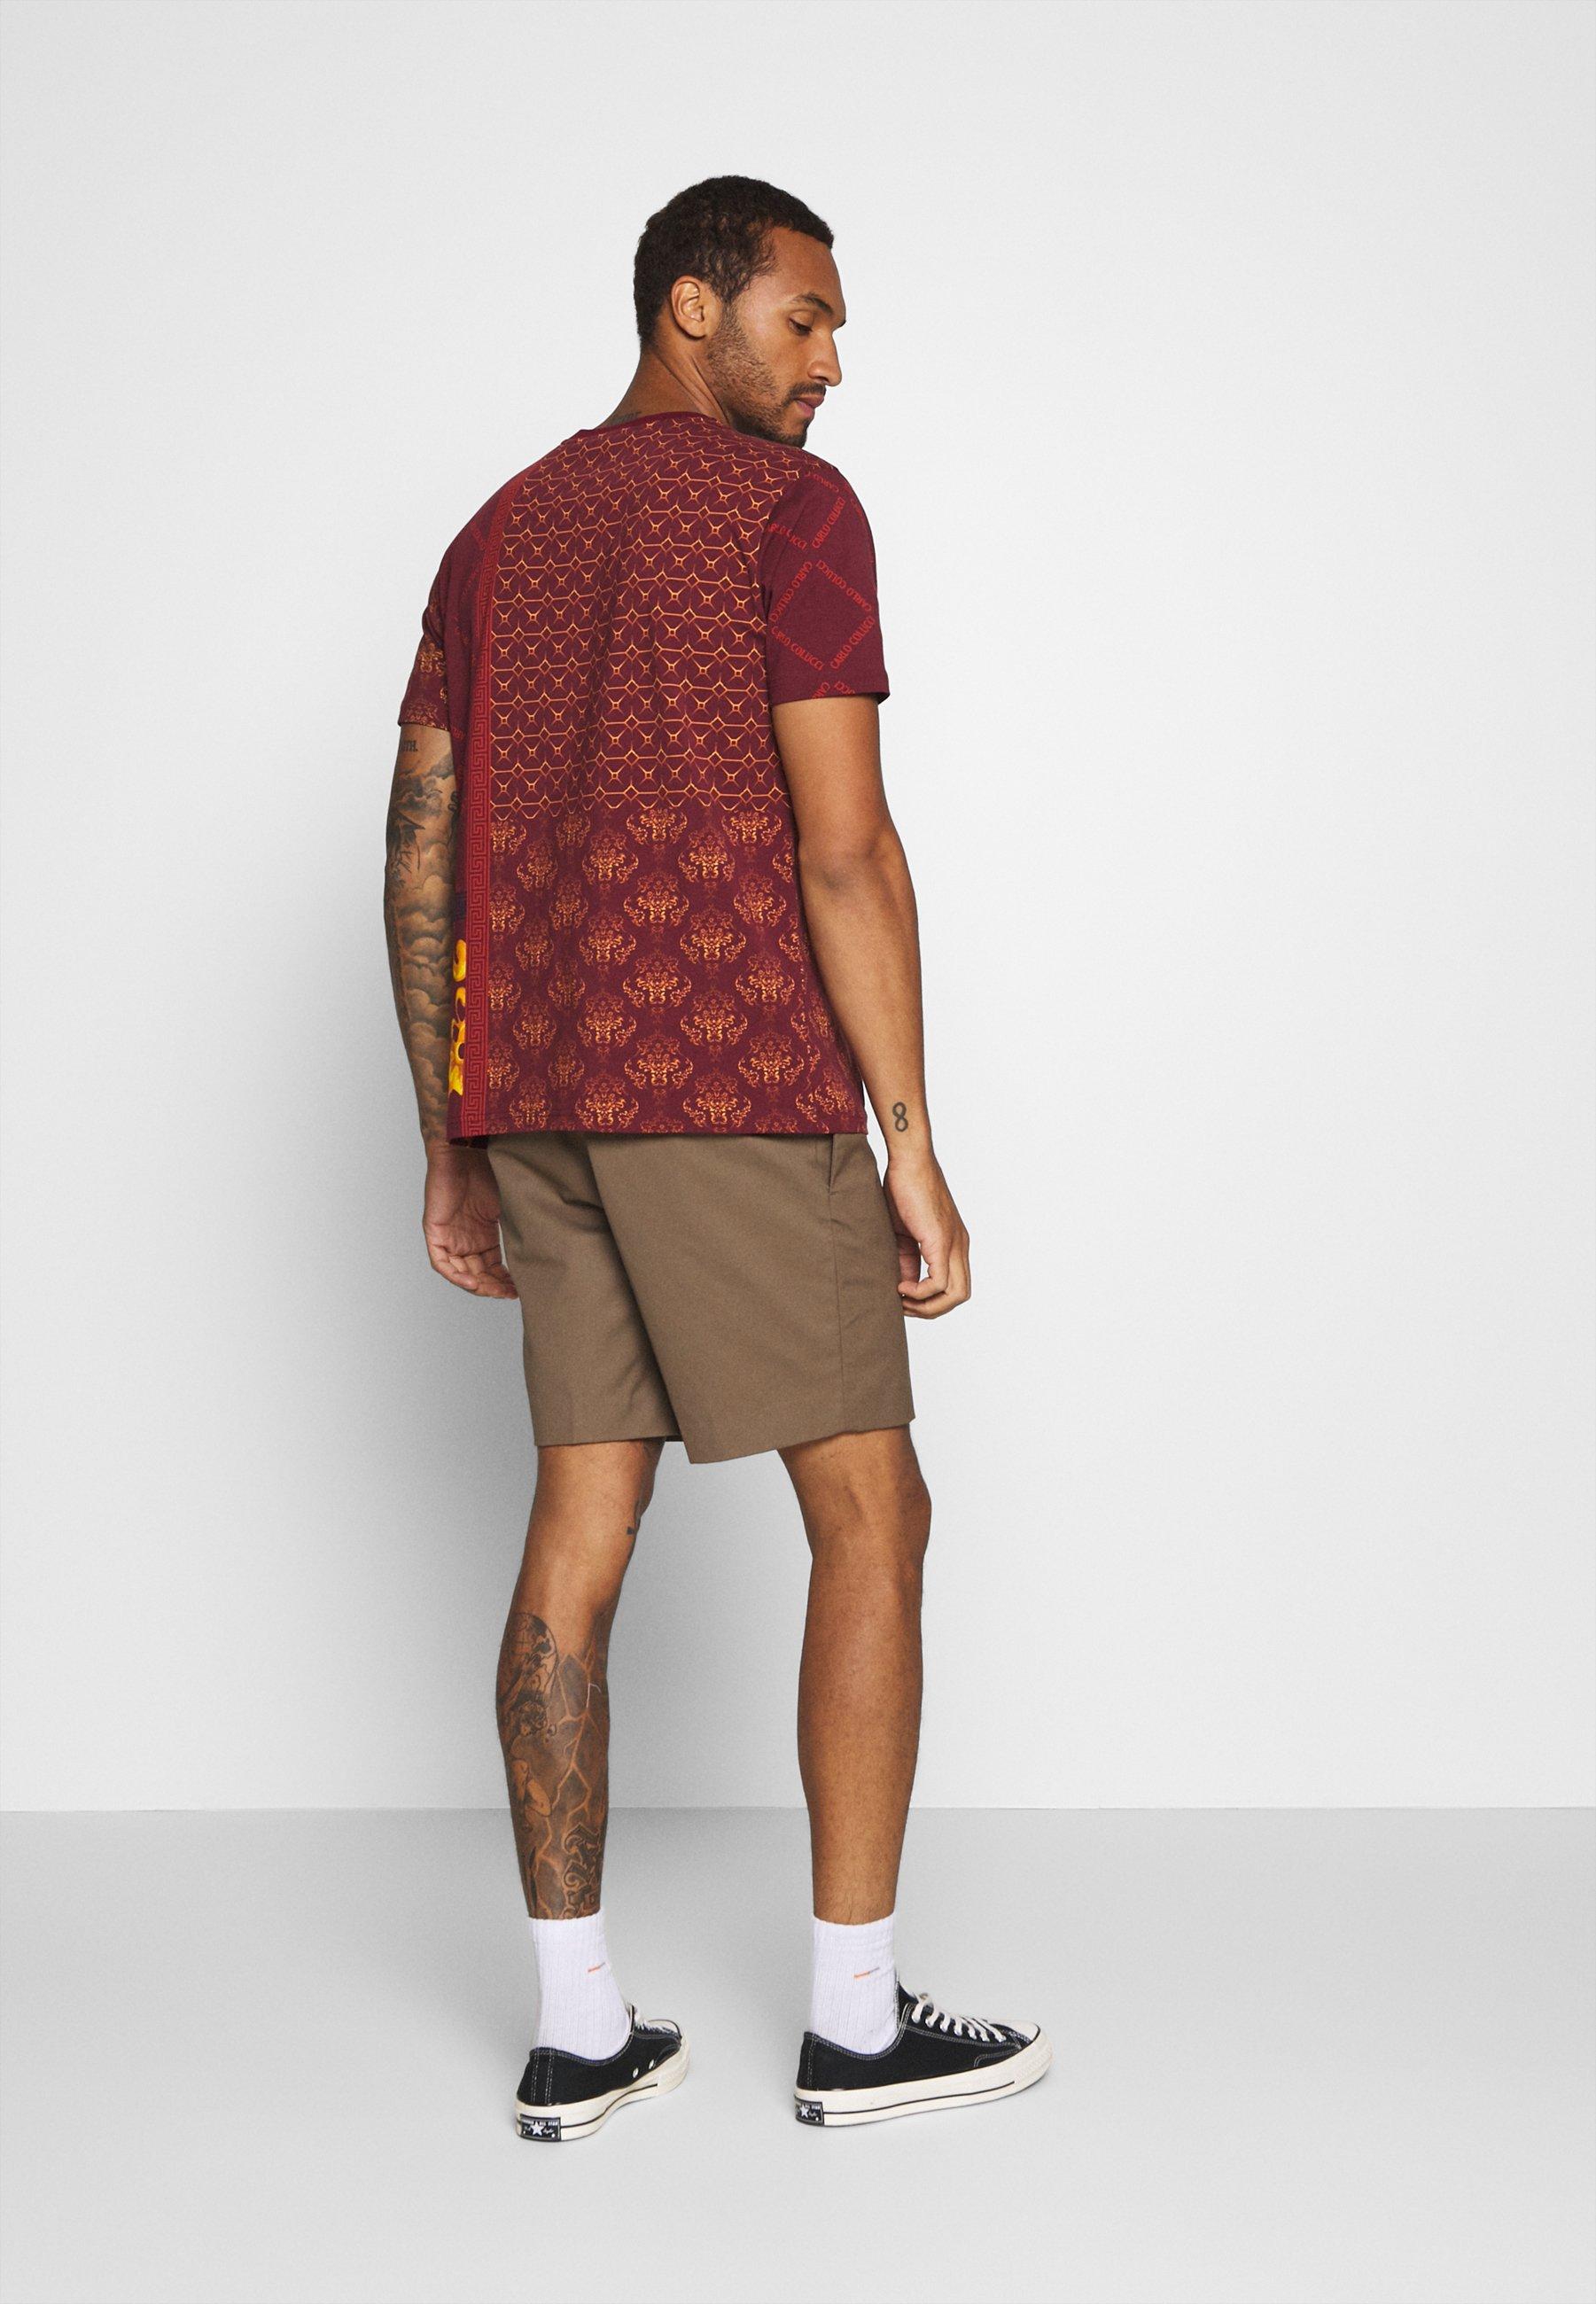 Carlo Colucci Print T-shirt - bordeaux gM7Pn